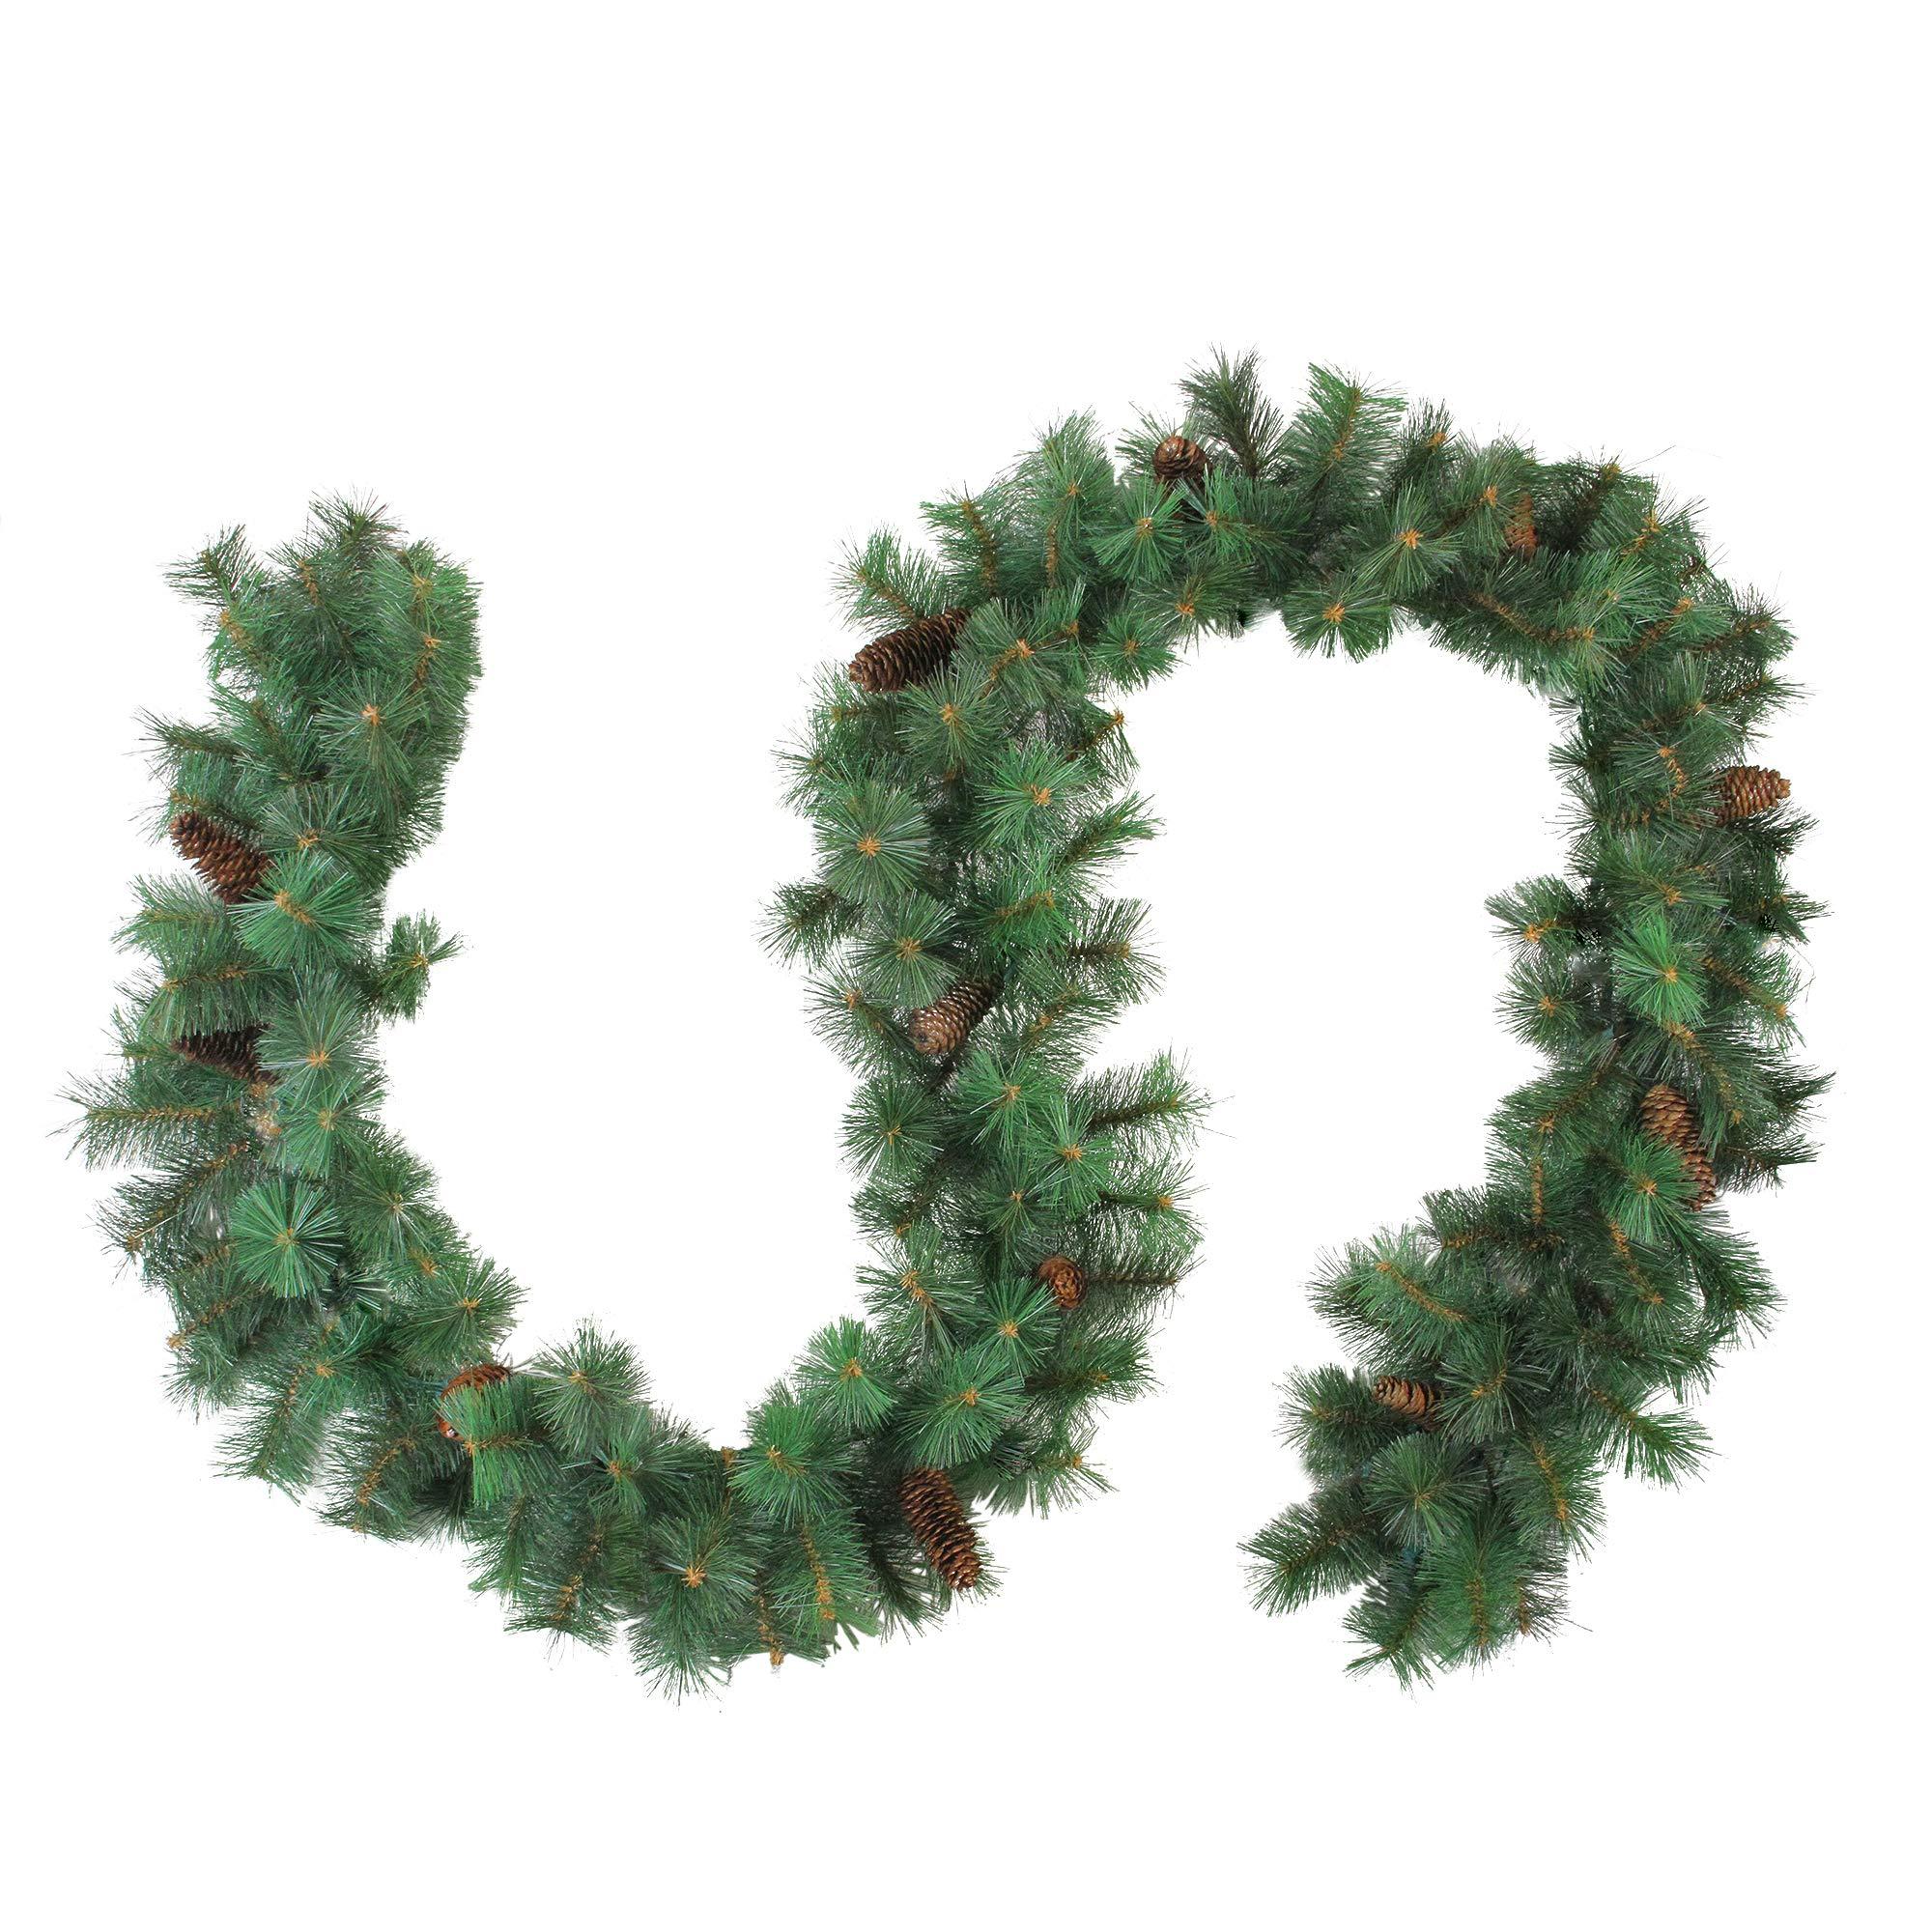 Northlight 9' x 12'' Royal Oregon Pine Artificial Christmas Garland - Unlit